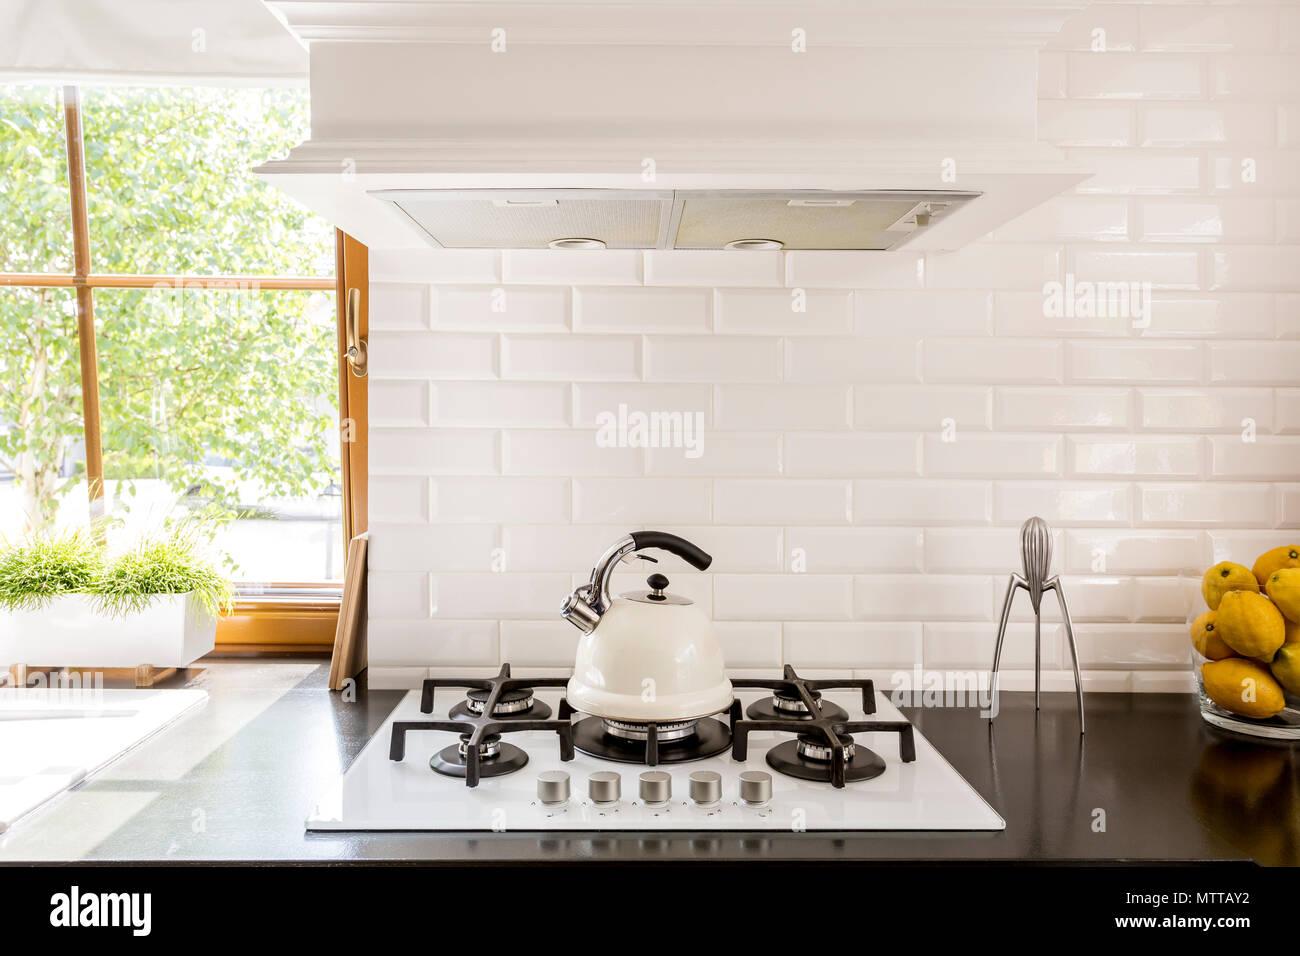 https www alamy com new style kitchen with dark worktop white gas cooker and decorative brick backsplash image187390870 html